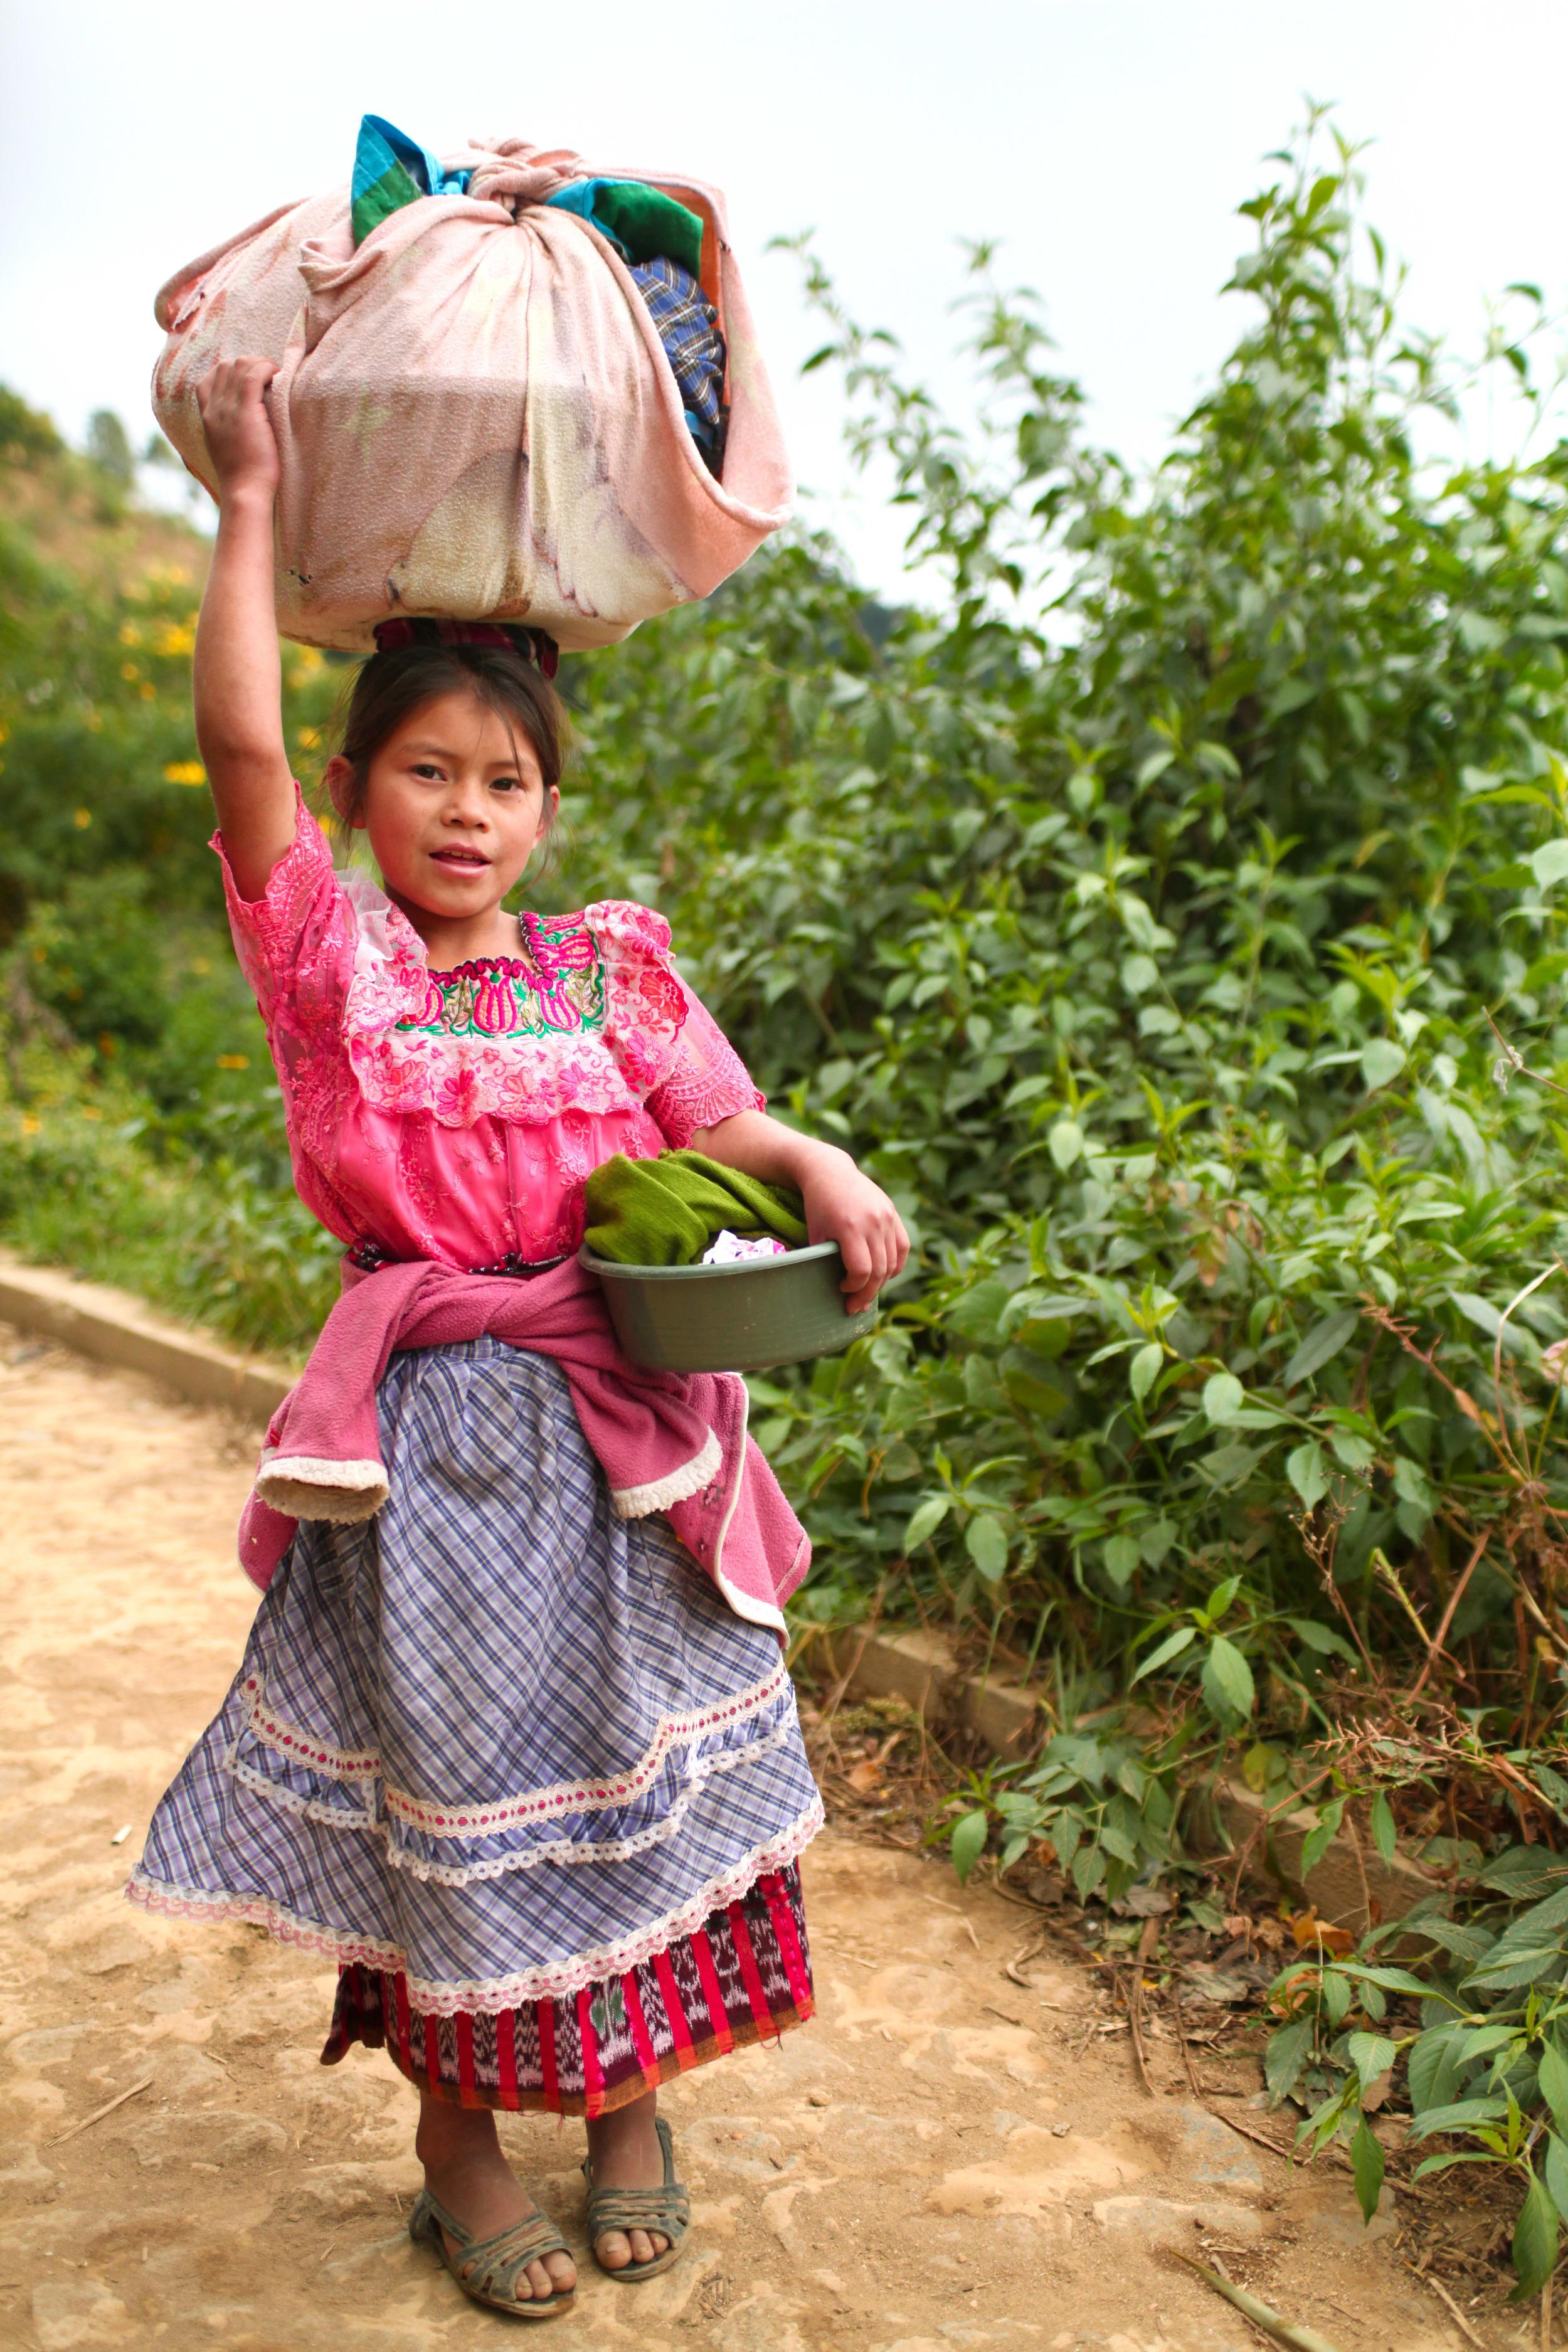 Guate_Vuelta Grande girl (high res)-1.jpg